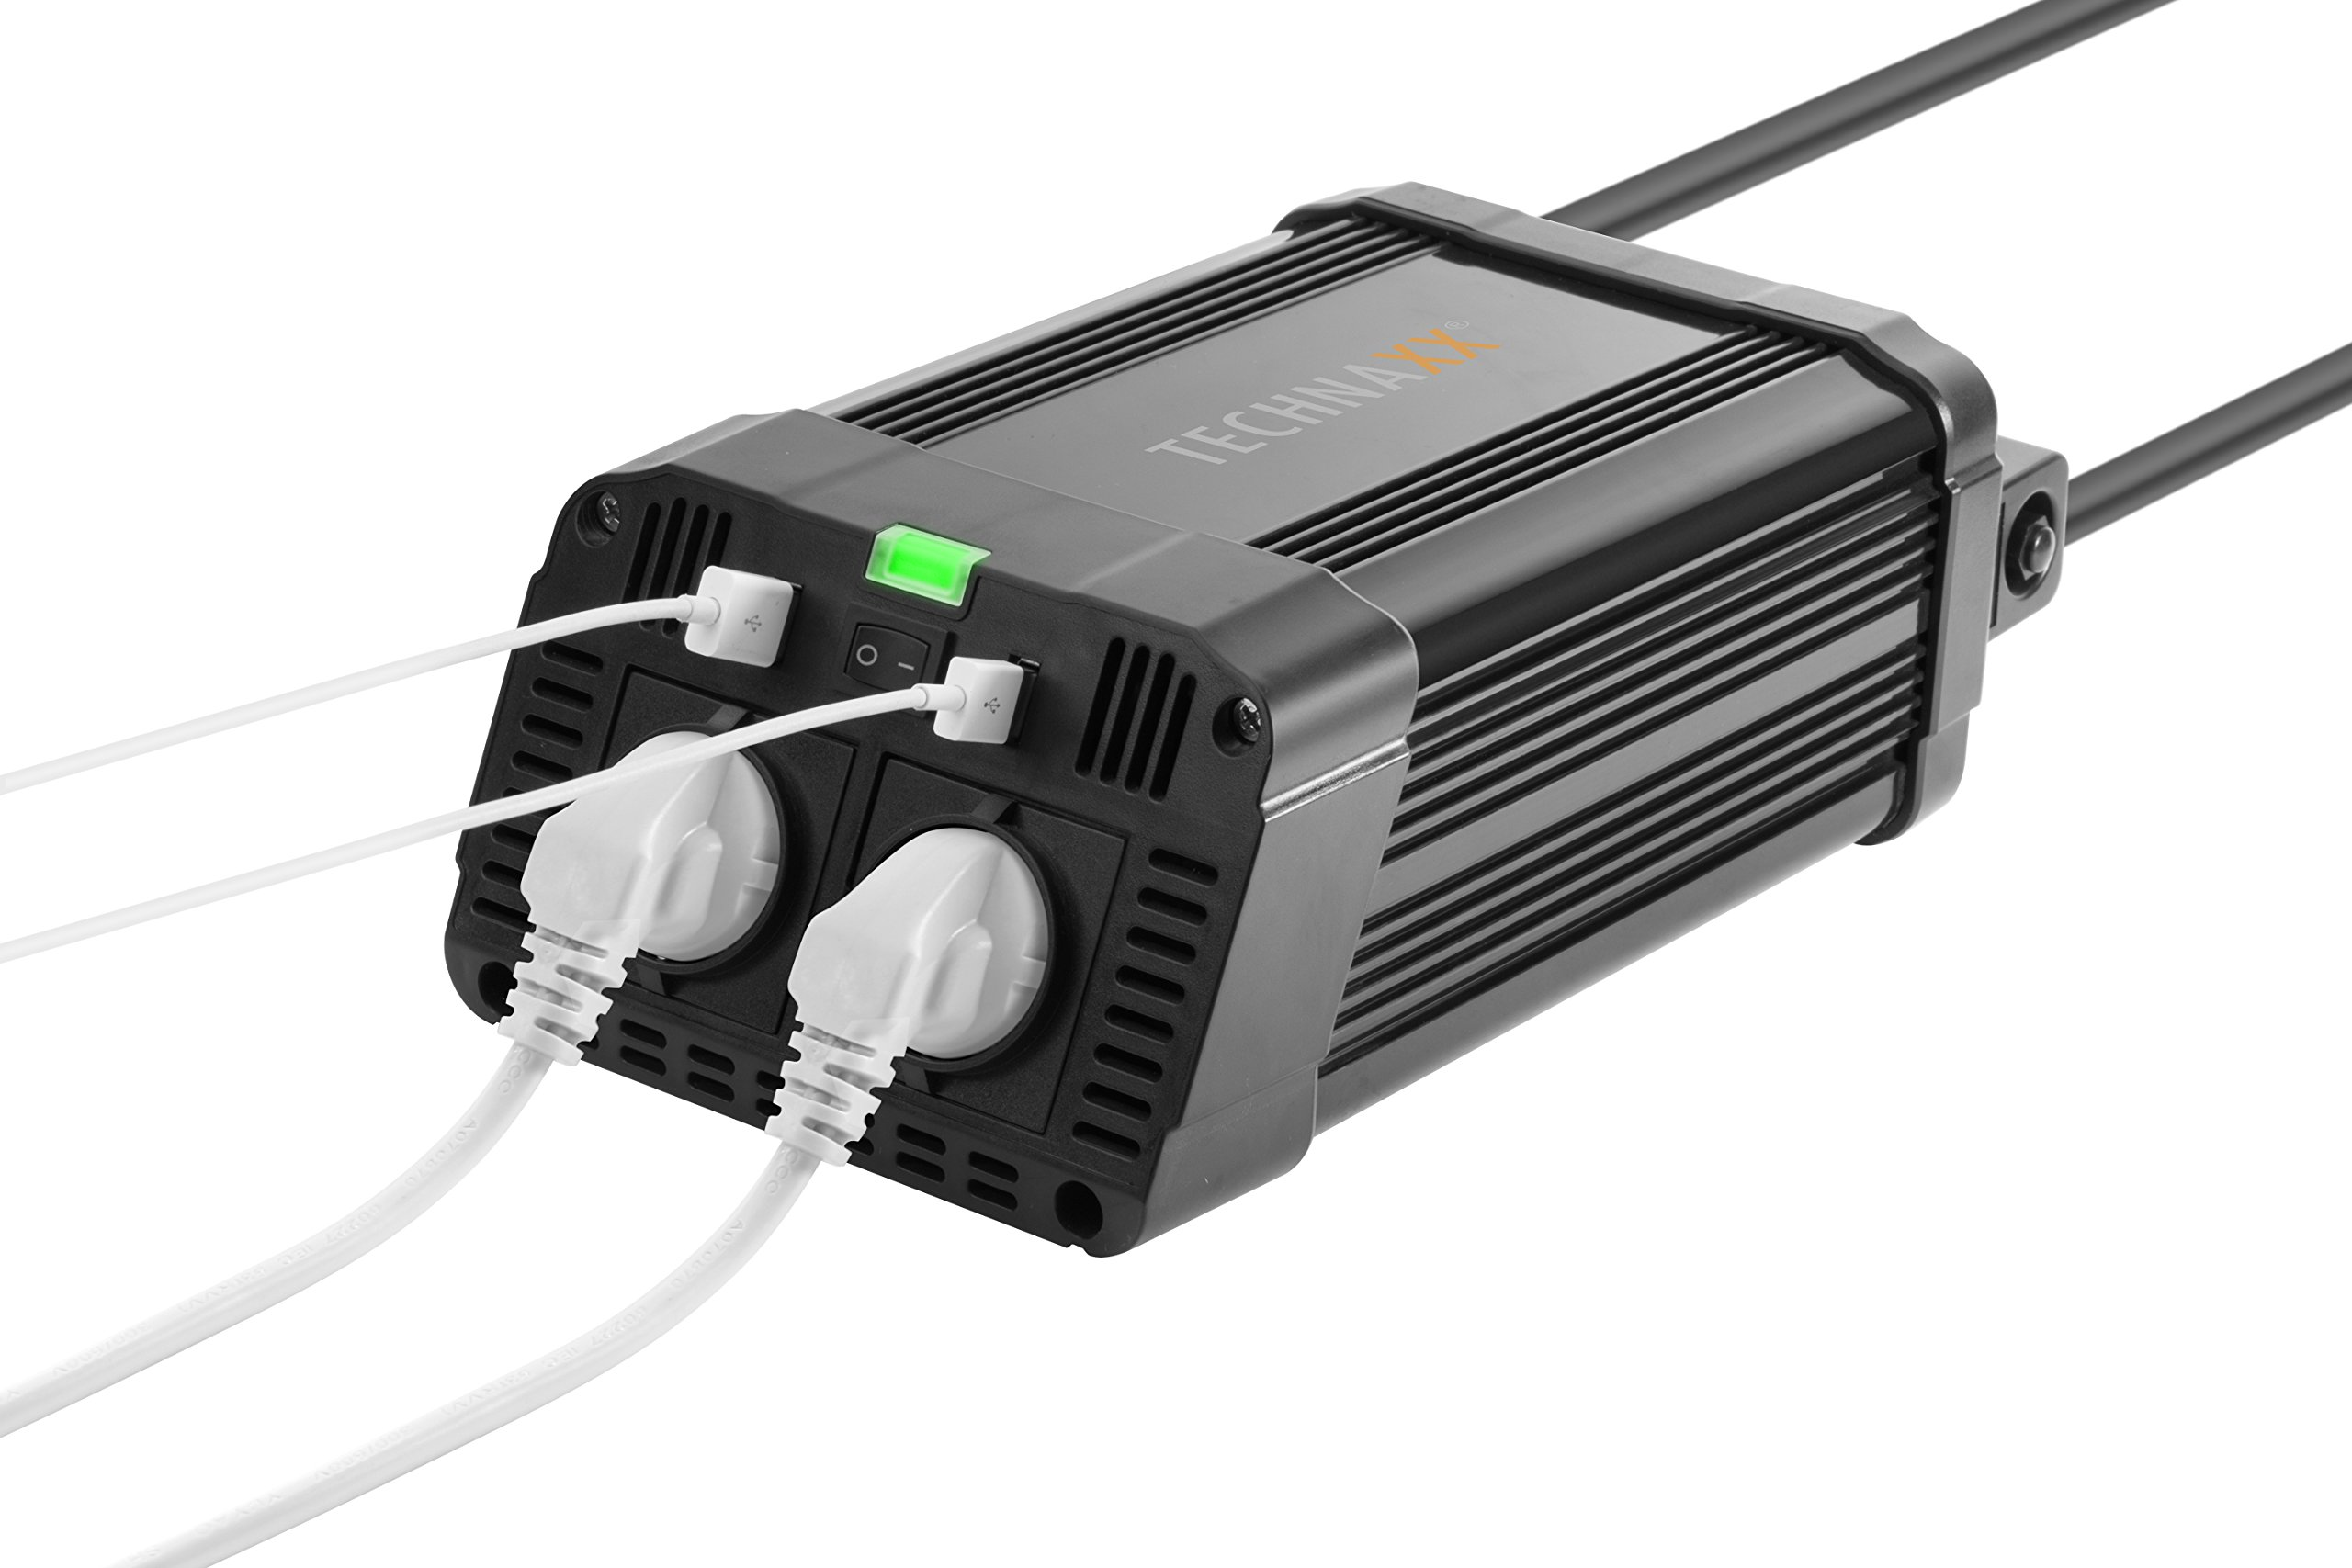 Technaxx-Wechselrichter-1200W-TE16-TV-Zertifiziert-Konverter-Strom-Spannungswandler-schwarz